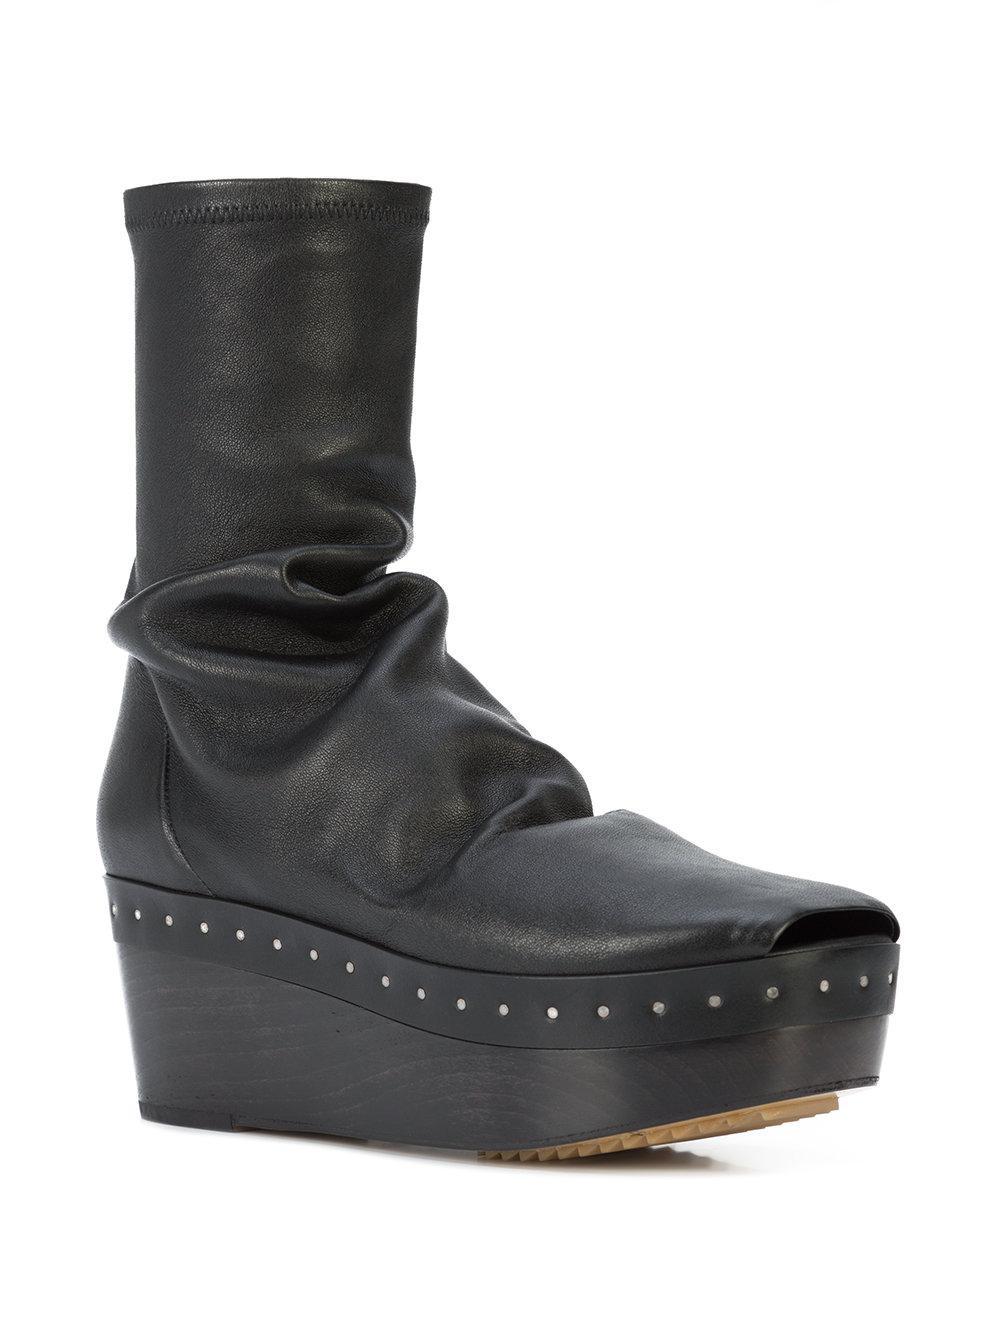 ef49624c792d Lyst - Rick Owens Sabot Sock Boots in Black - Save 57%